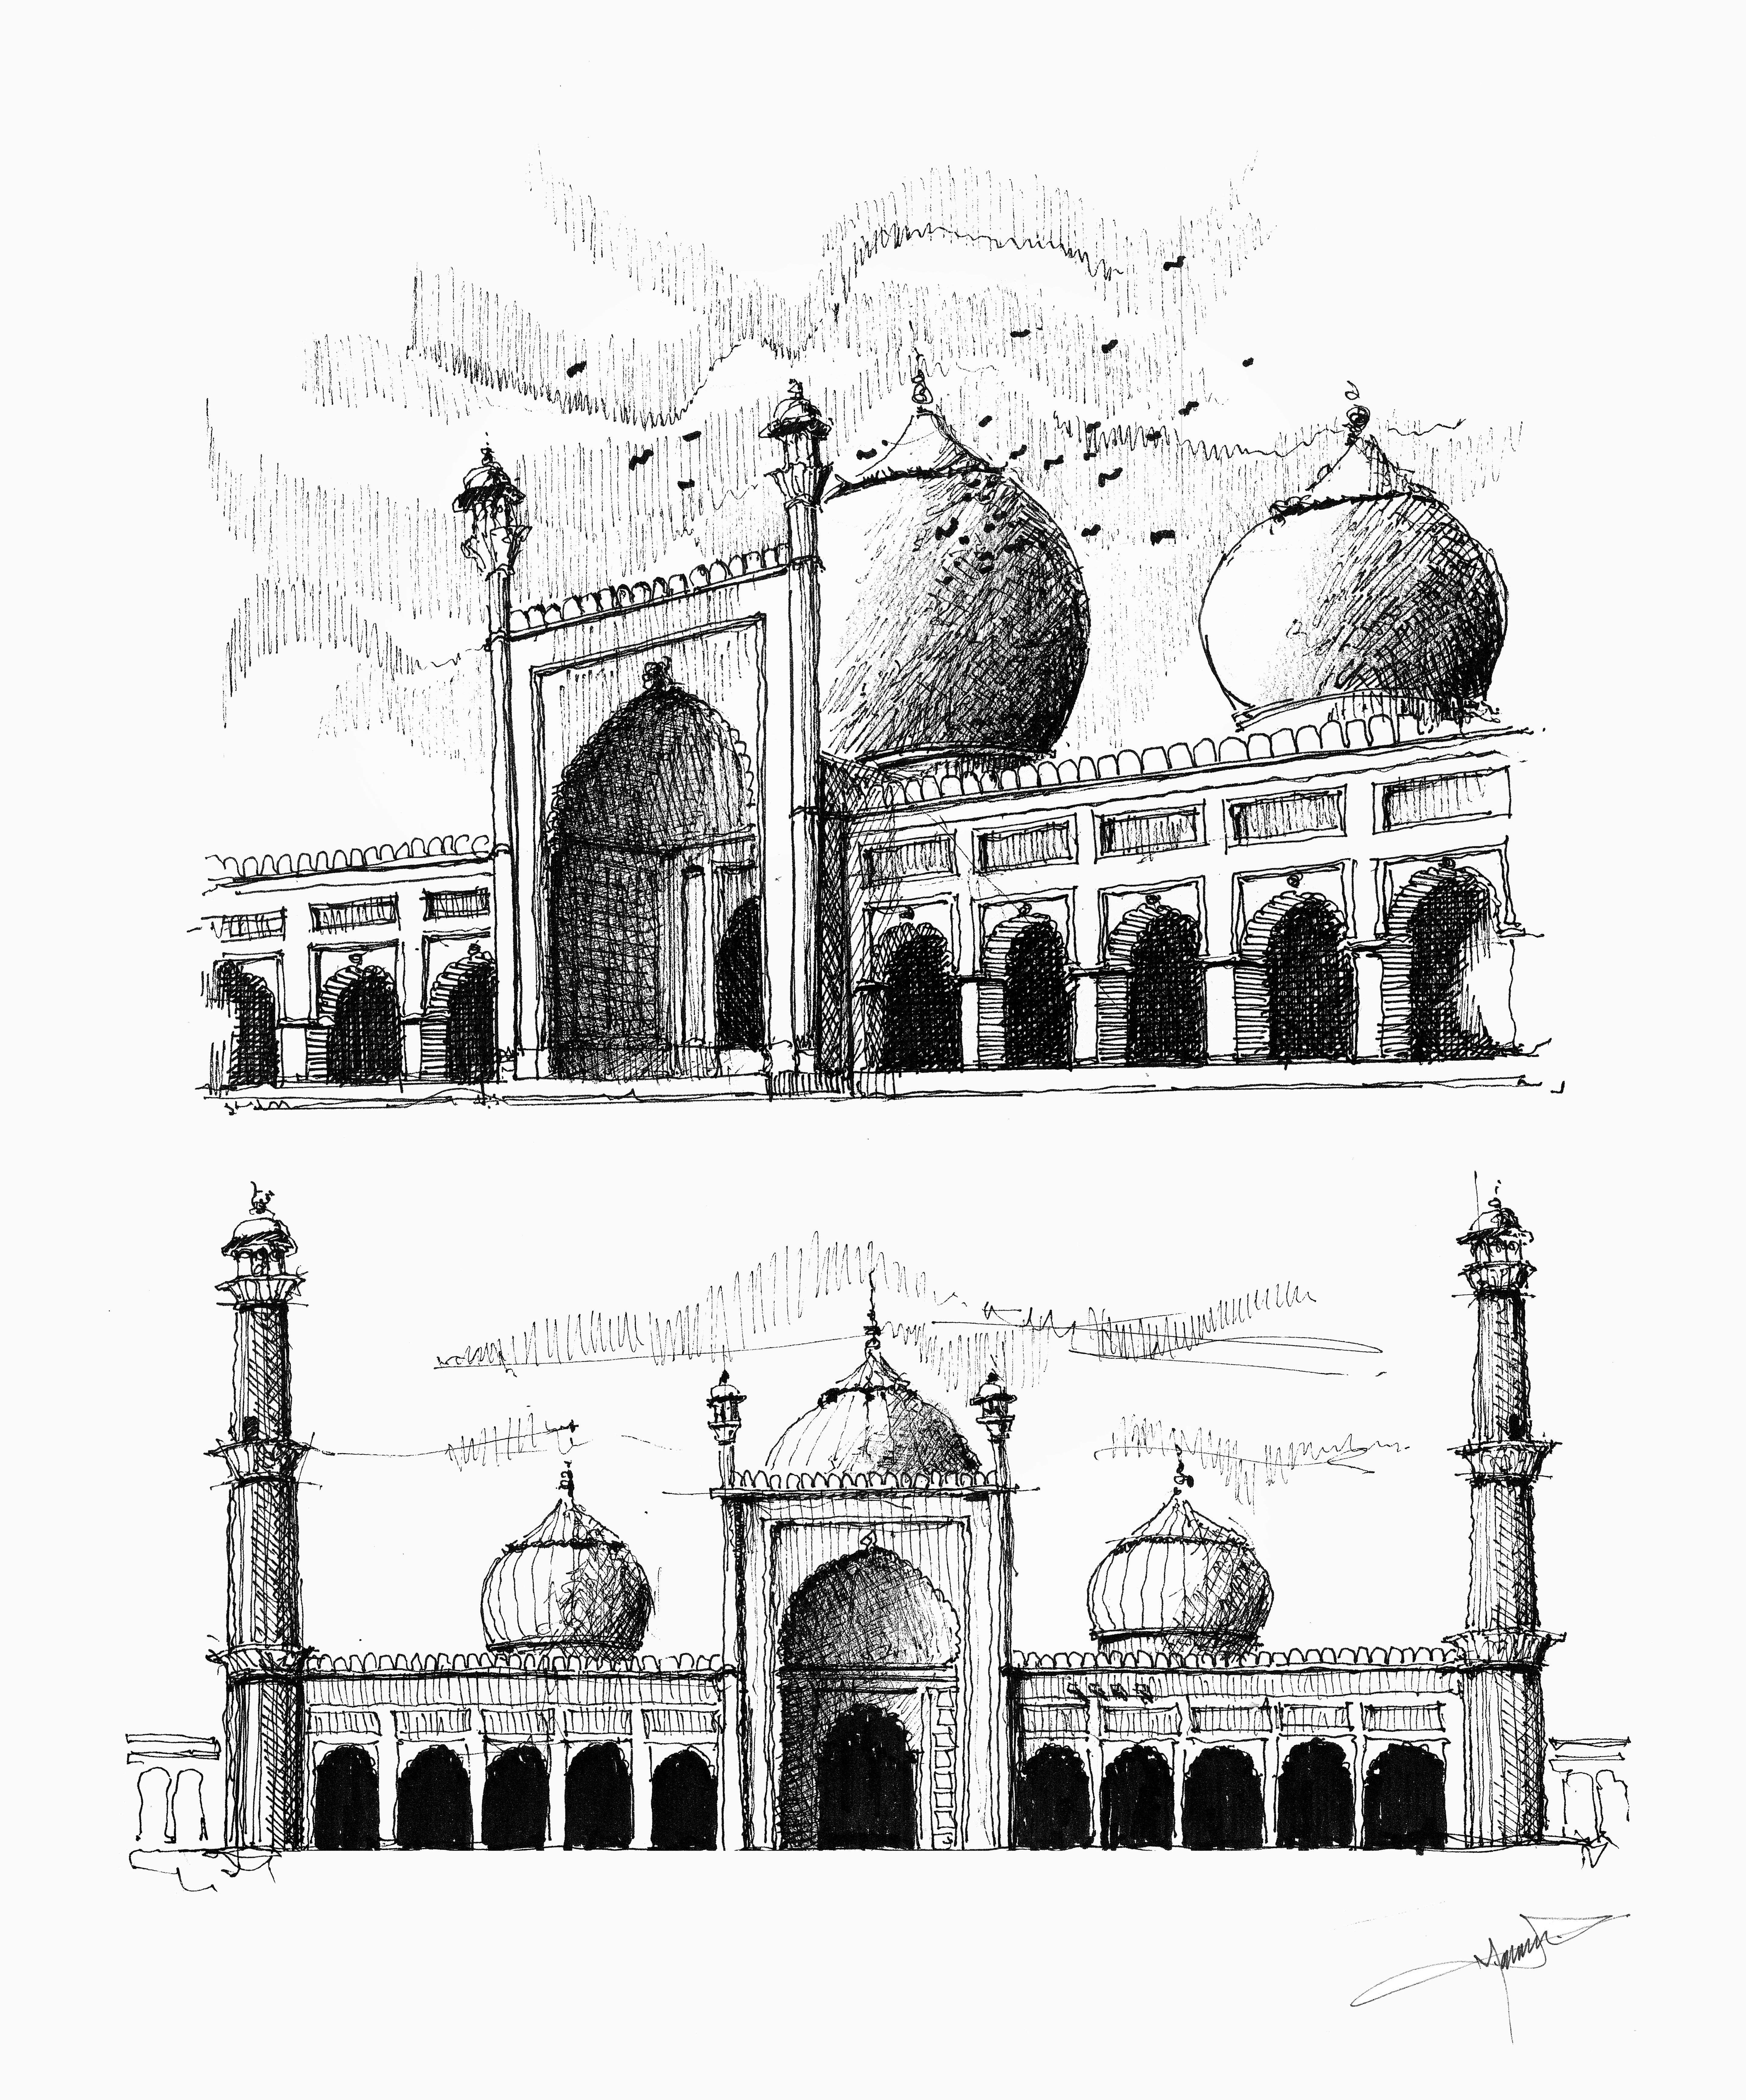 Jama Masjid Old Delhi India Ink Drawing Copyright C 2017